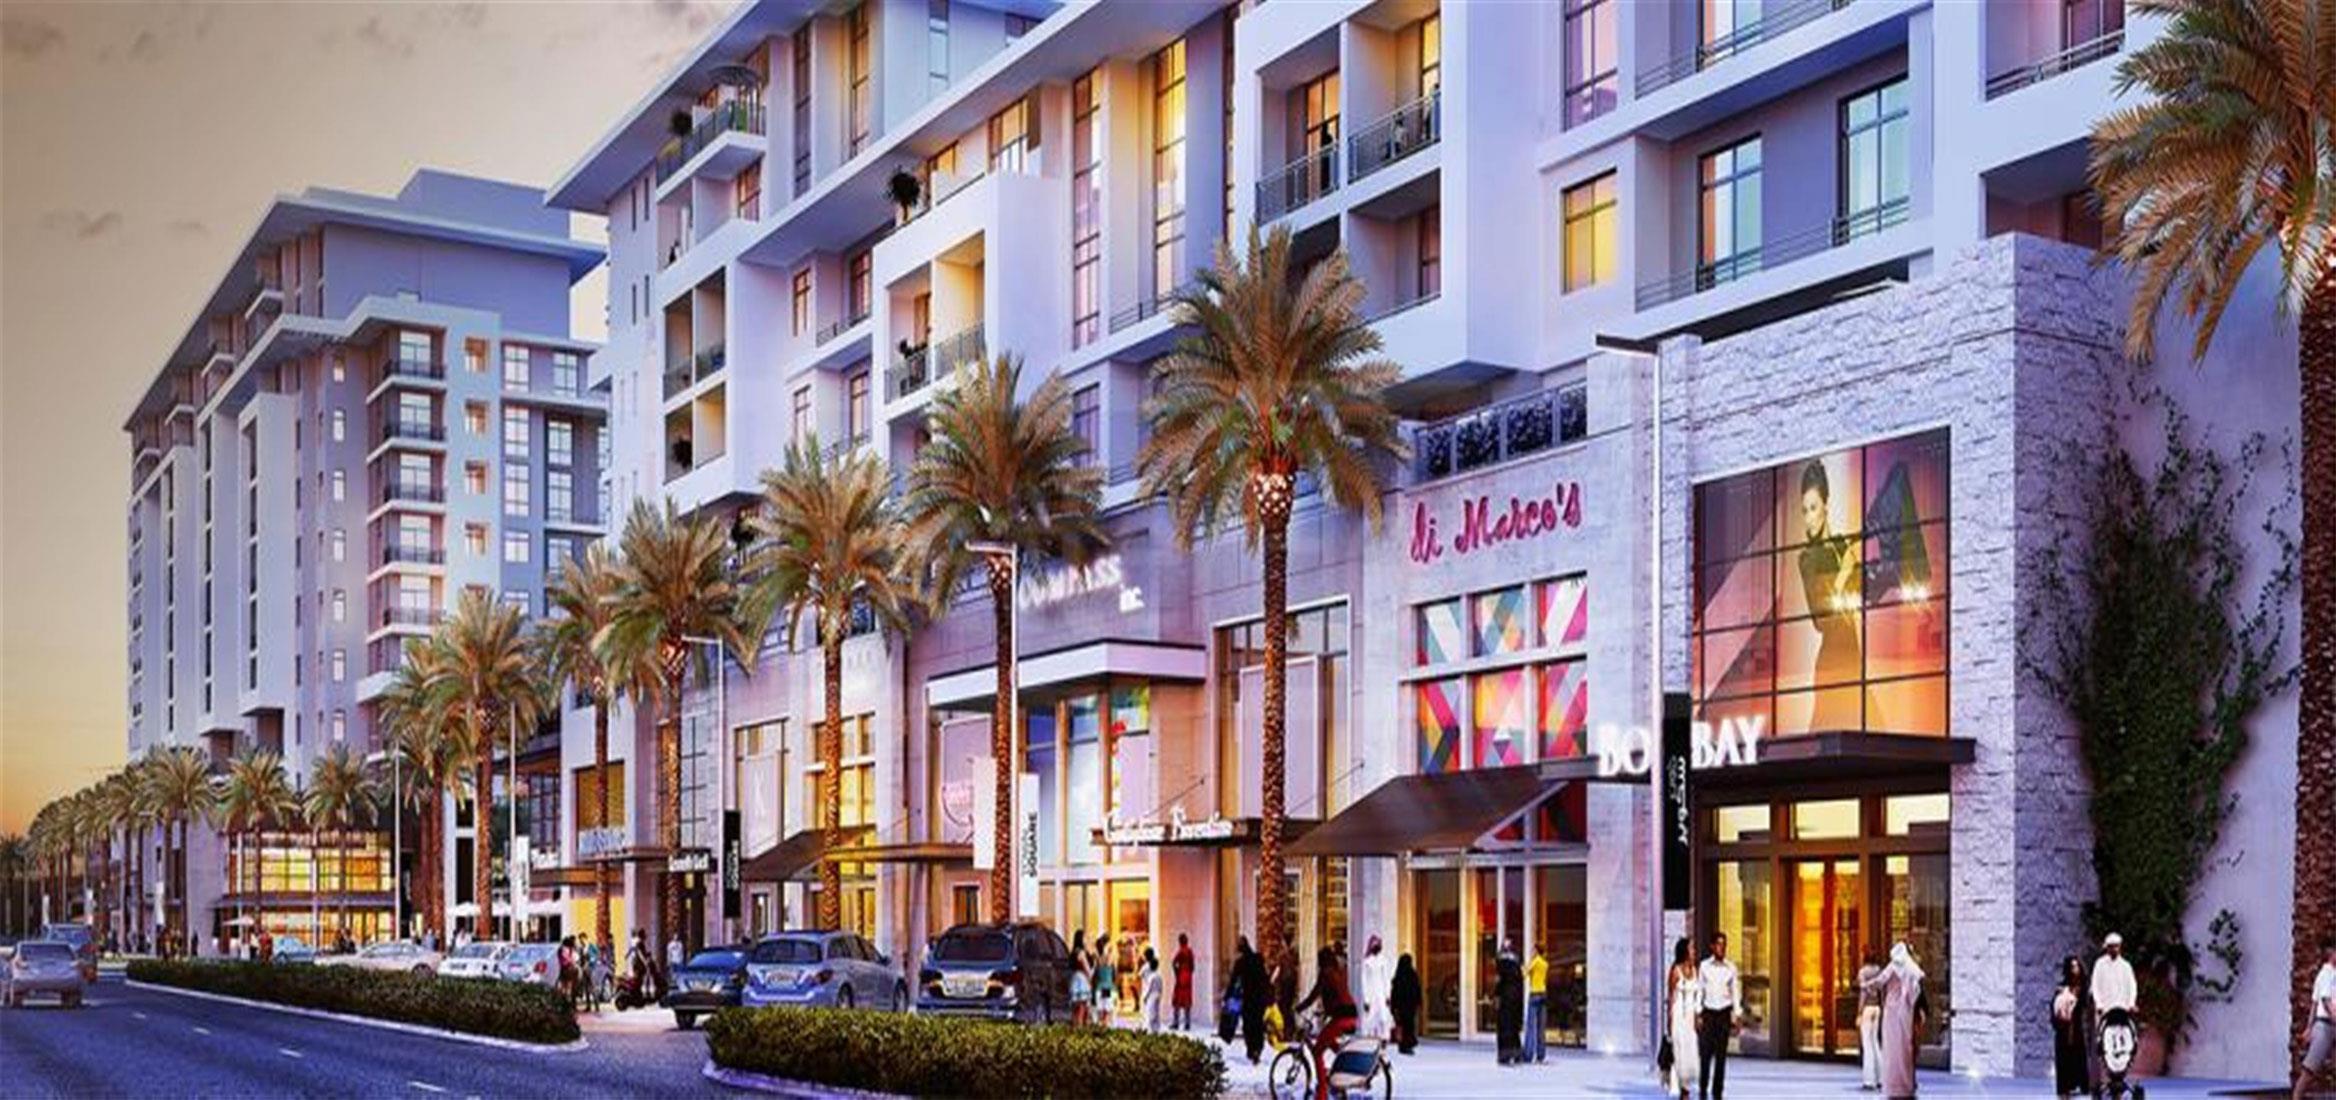 Town Square Dubai